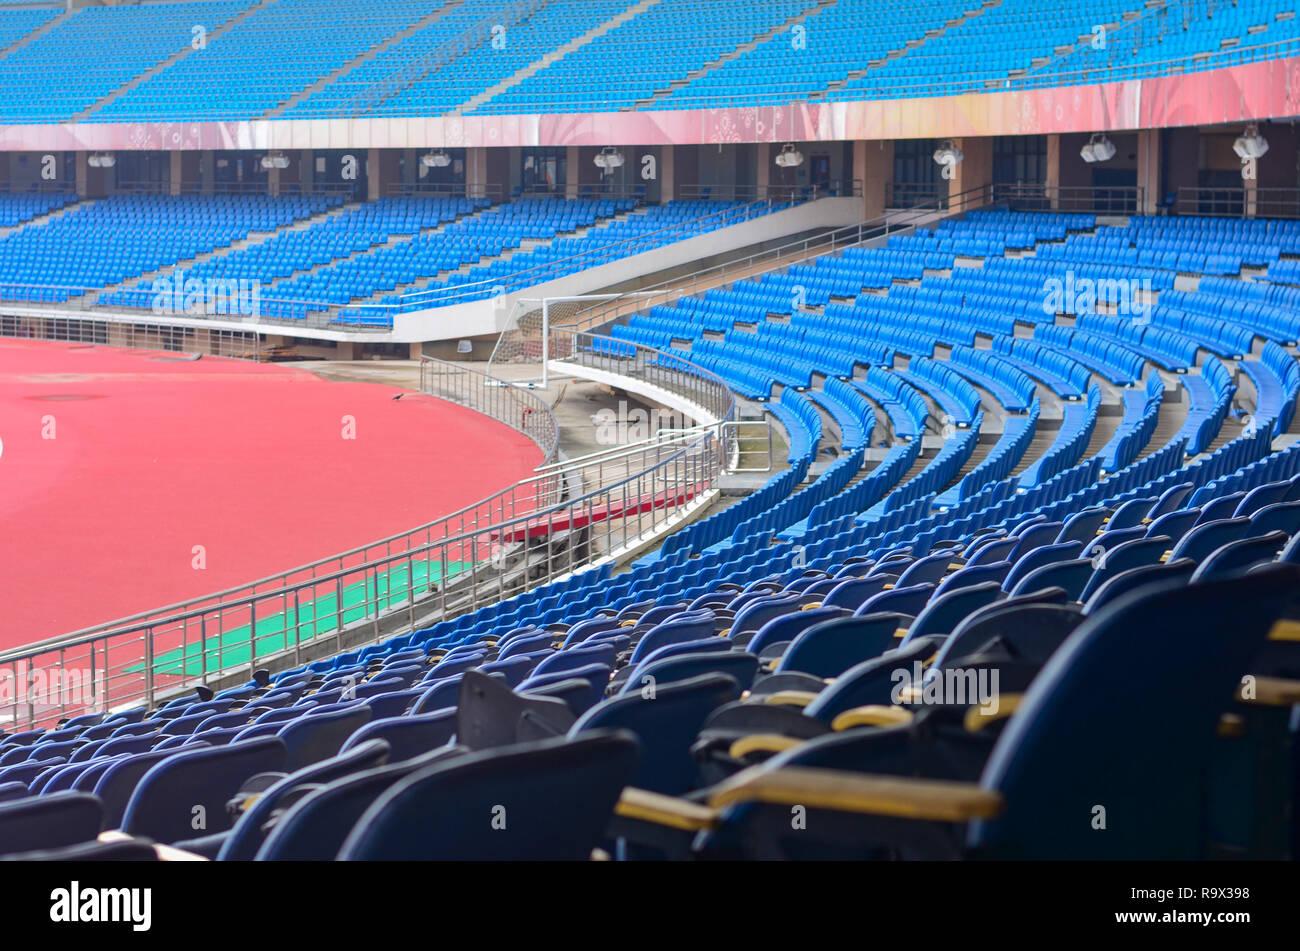 Empty blur seats of Jawaharlal Nehru Stadium (JLN) in Delhi, India - Stock Image